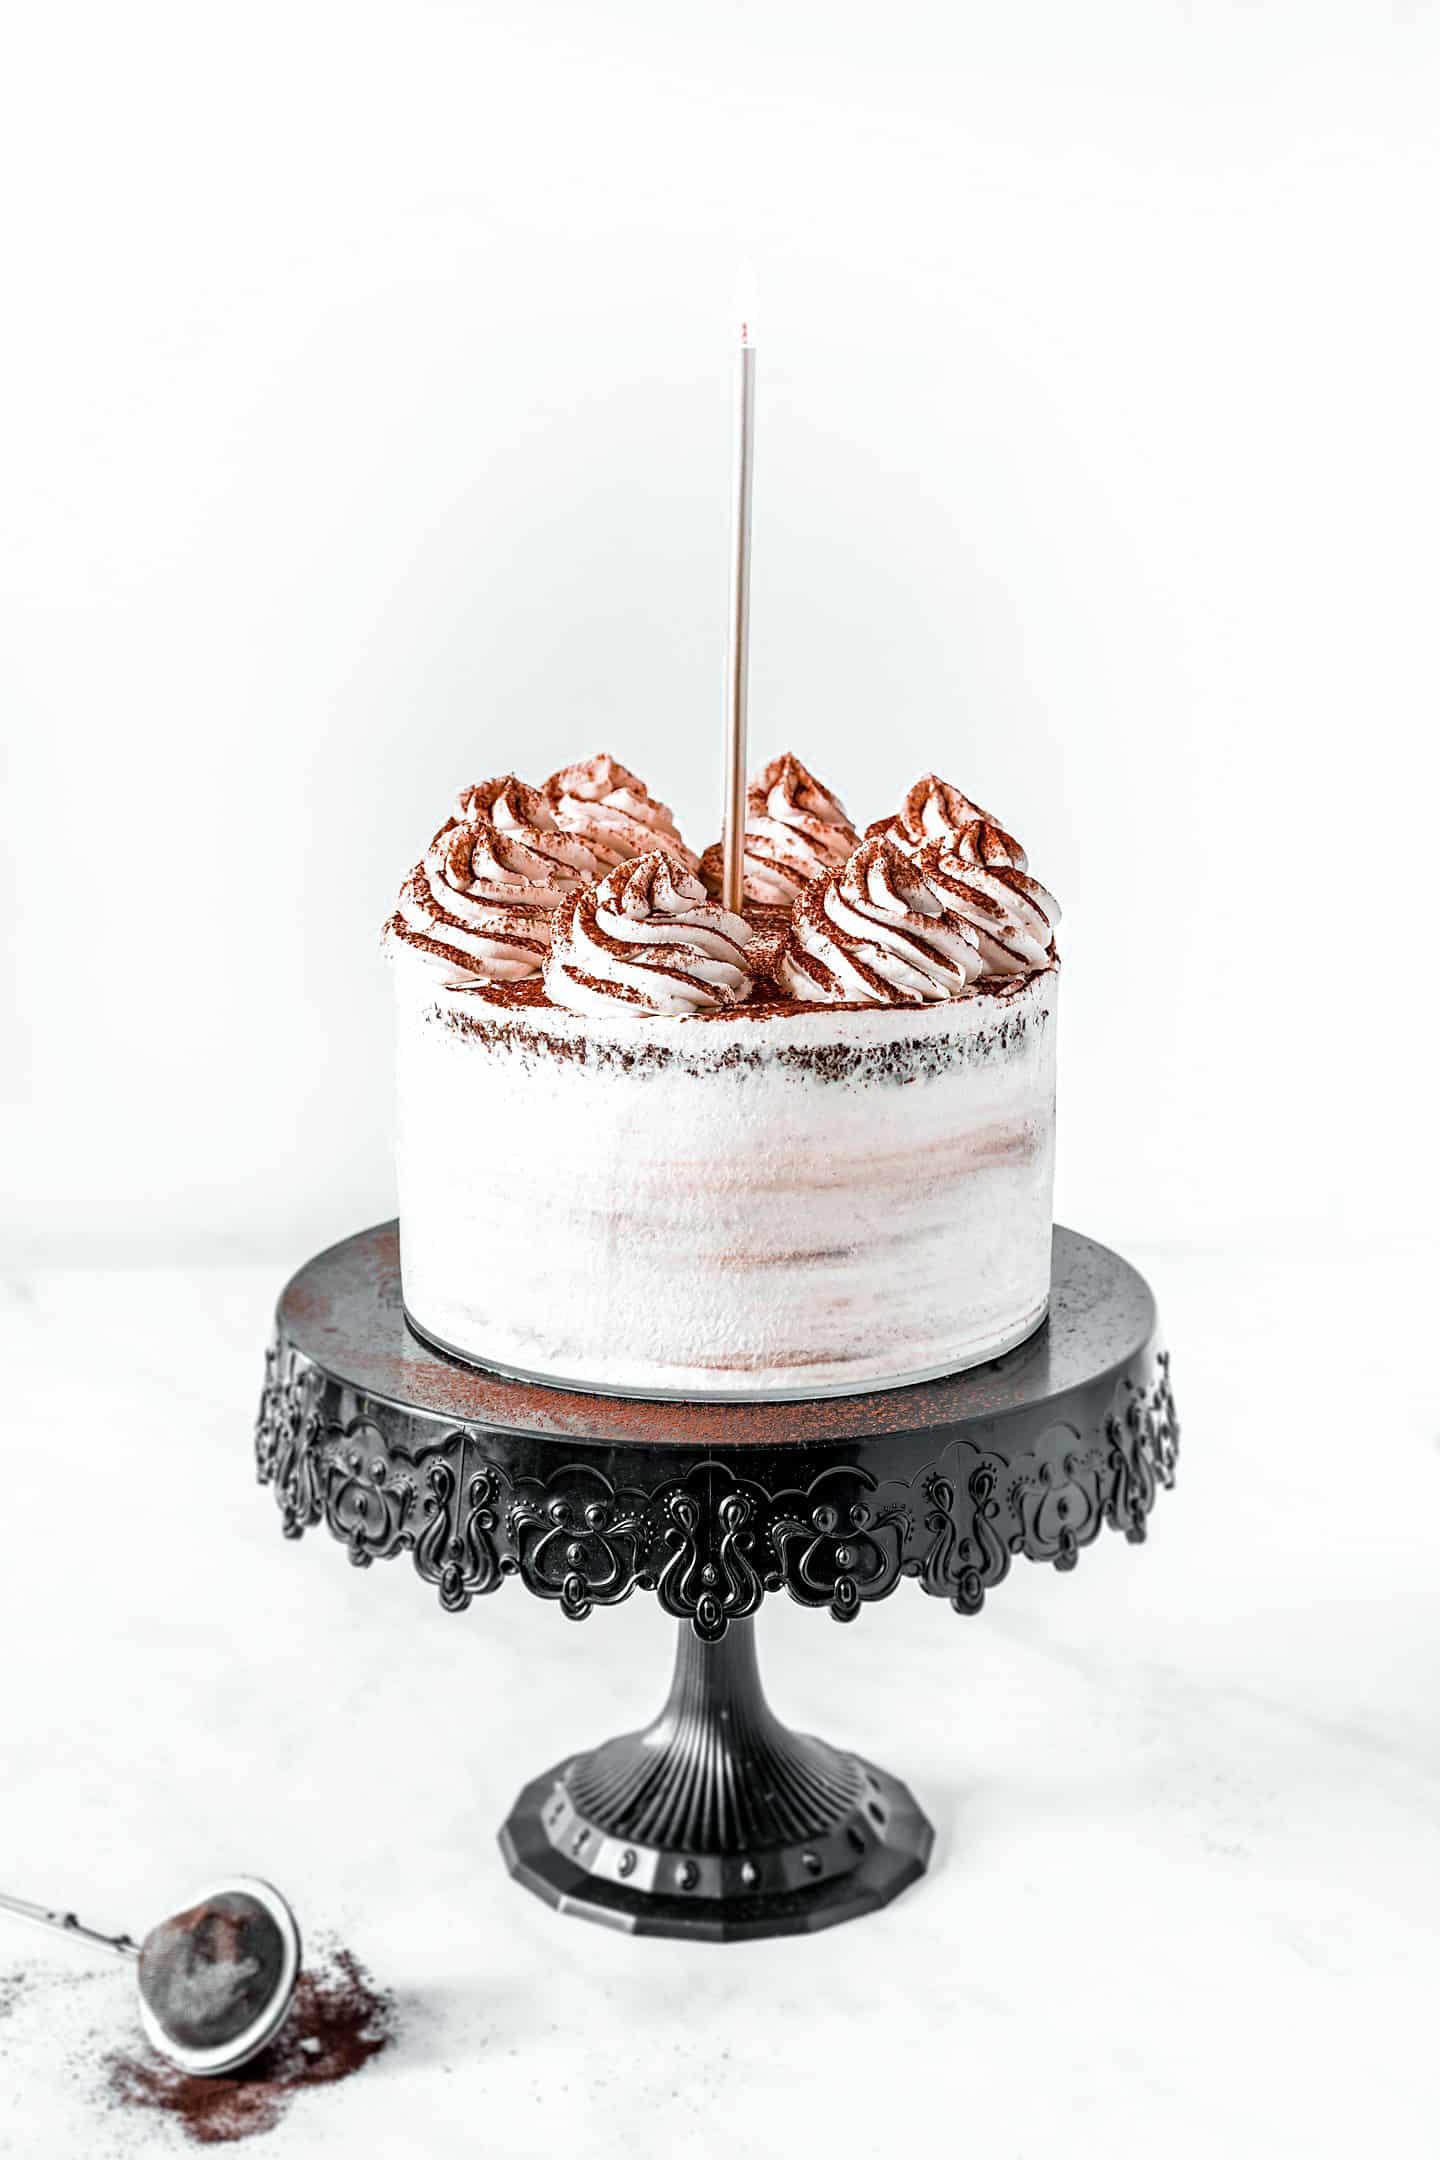 Layer cake chocolat et ganache montée